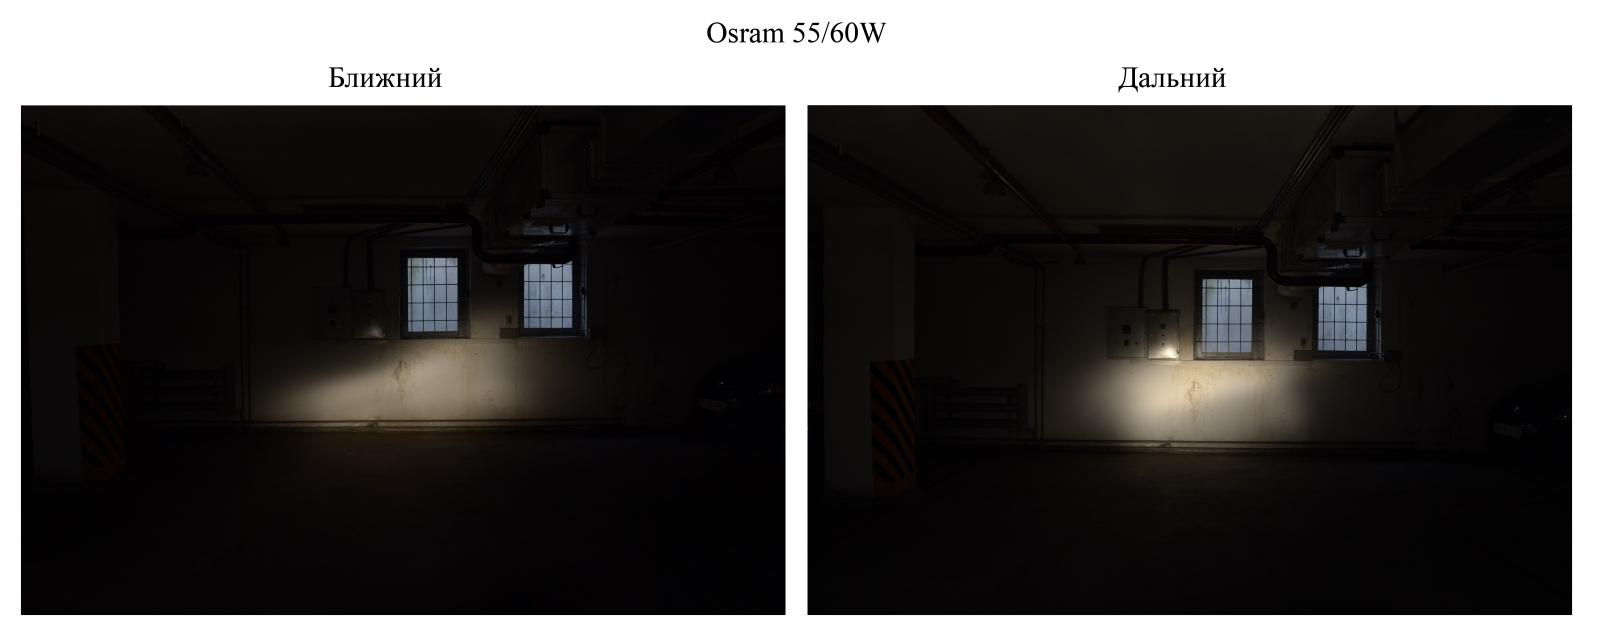 Доработка штатного света - Страница 6 Wb43rc